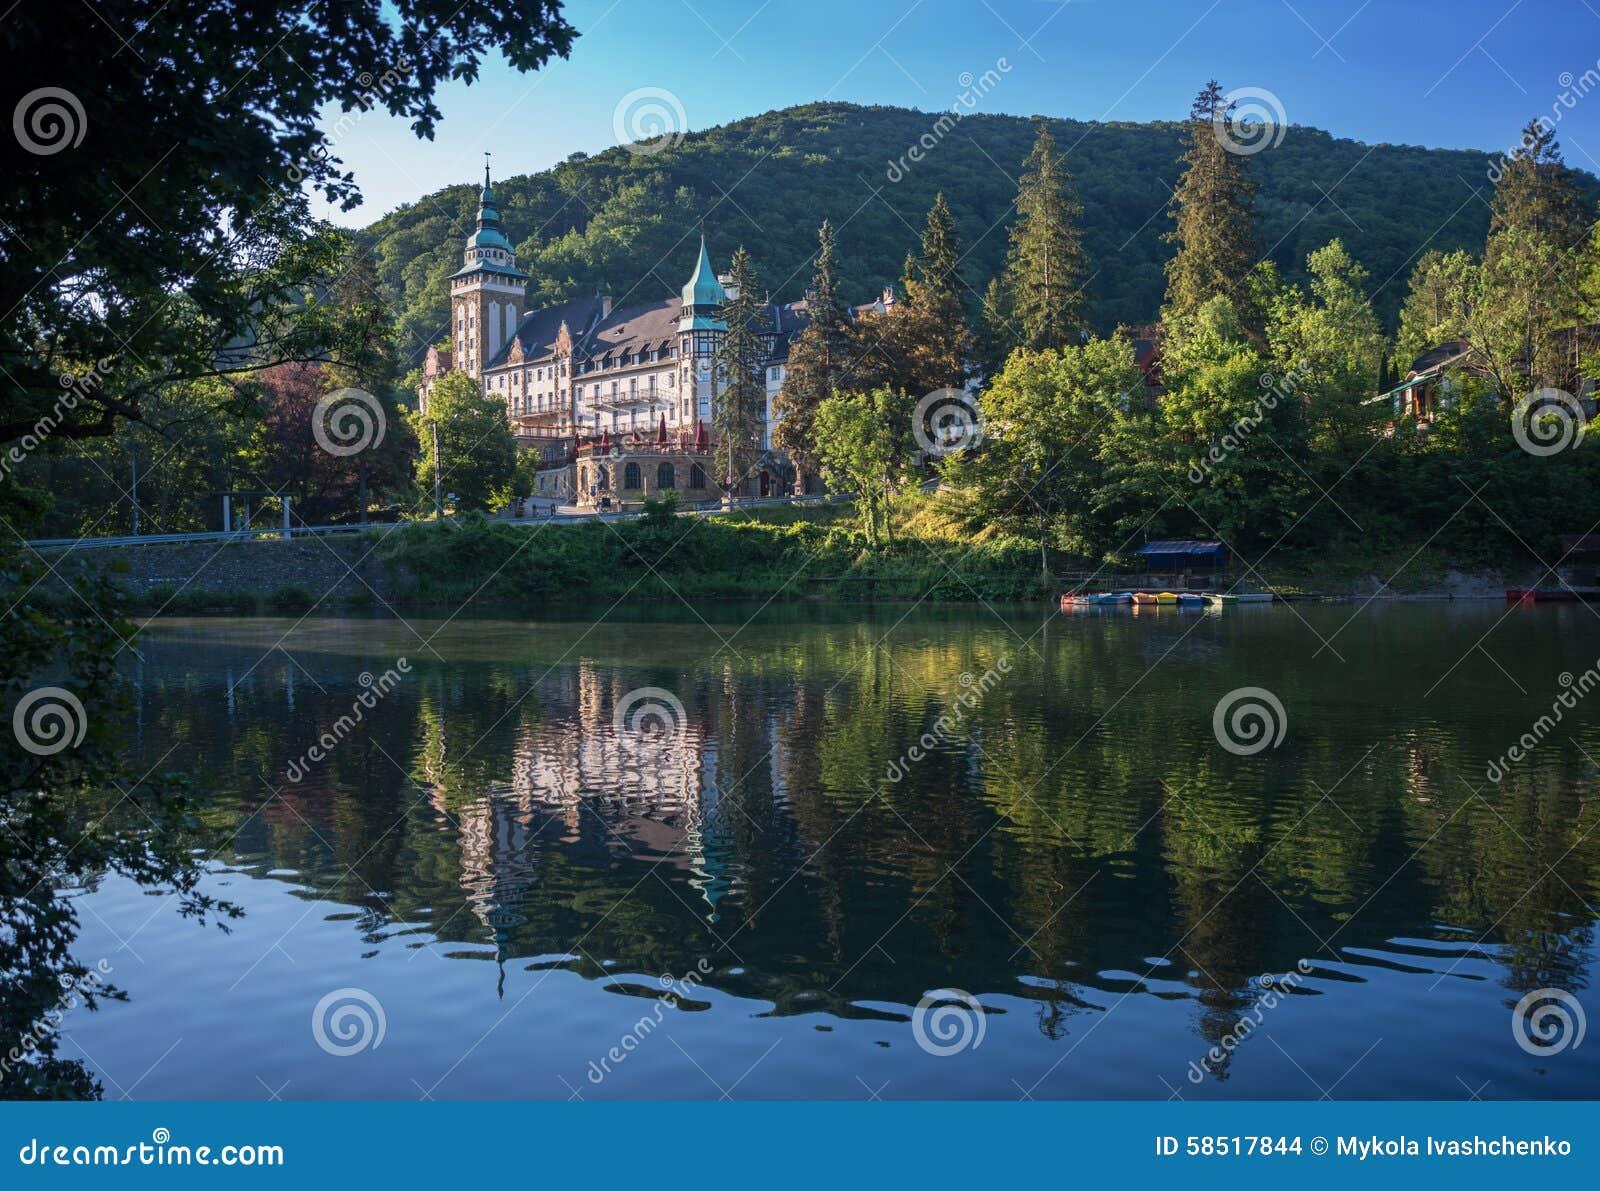 Lillafured pałac - Węgry